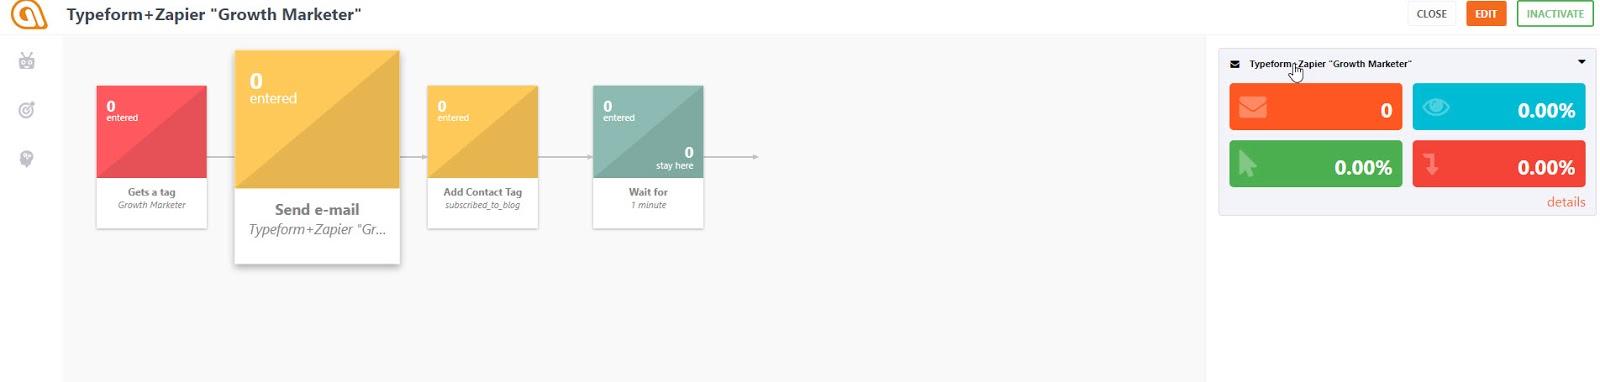 Typeform workflow